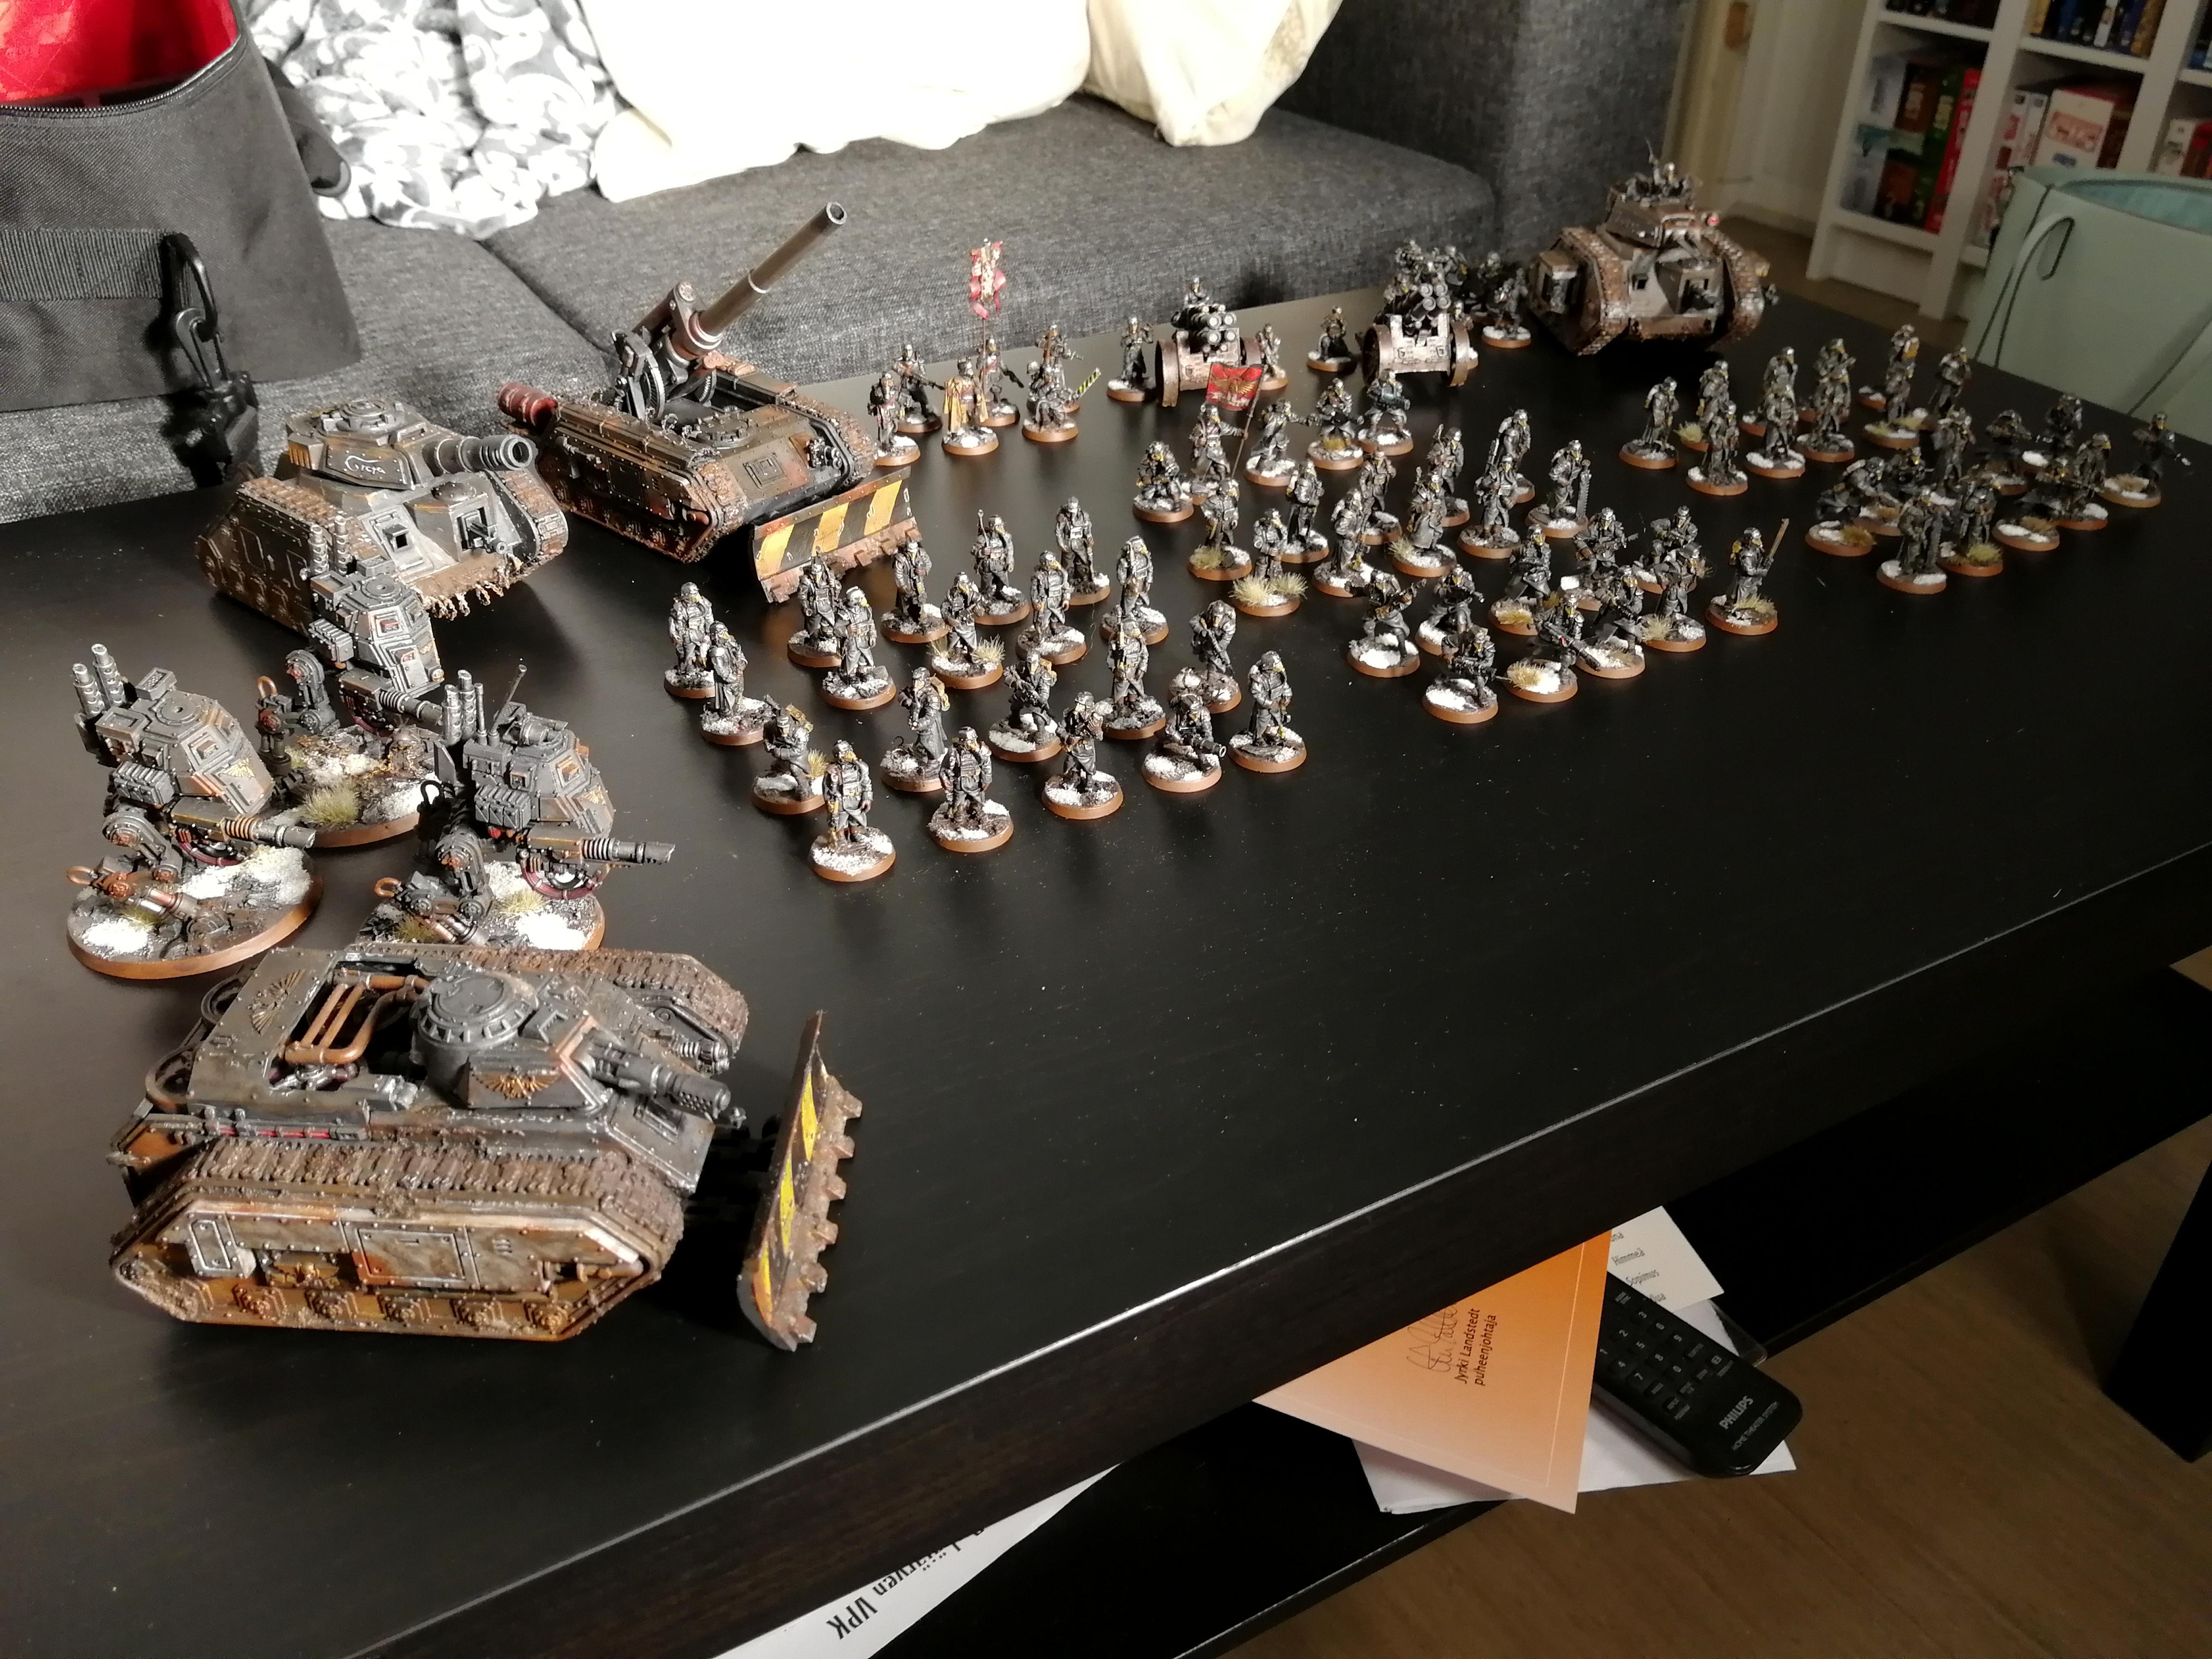 Army, Astra Militarum, Basilisk, Death Korps of Krieg, Hellhound, Imperial Guard, Infantry, Leman Russ, Sentinel, Tank, Warhammer 40,000